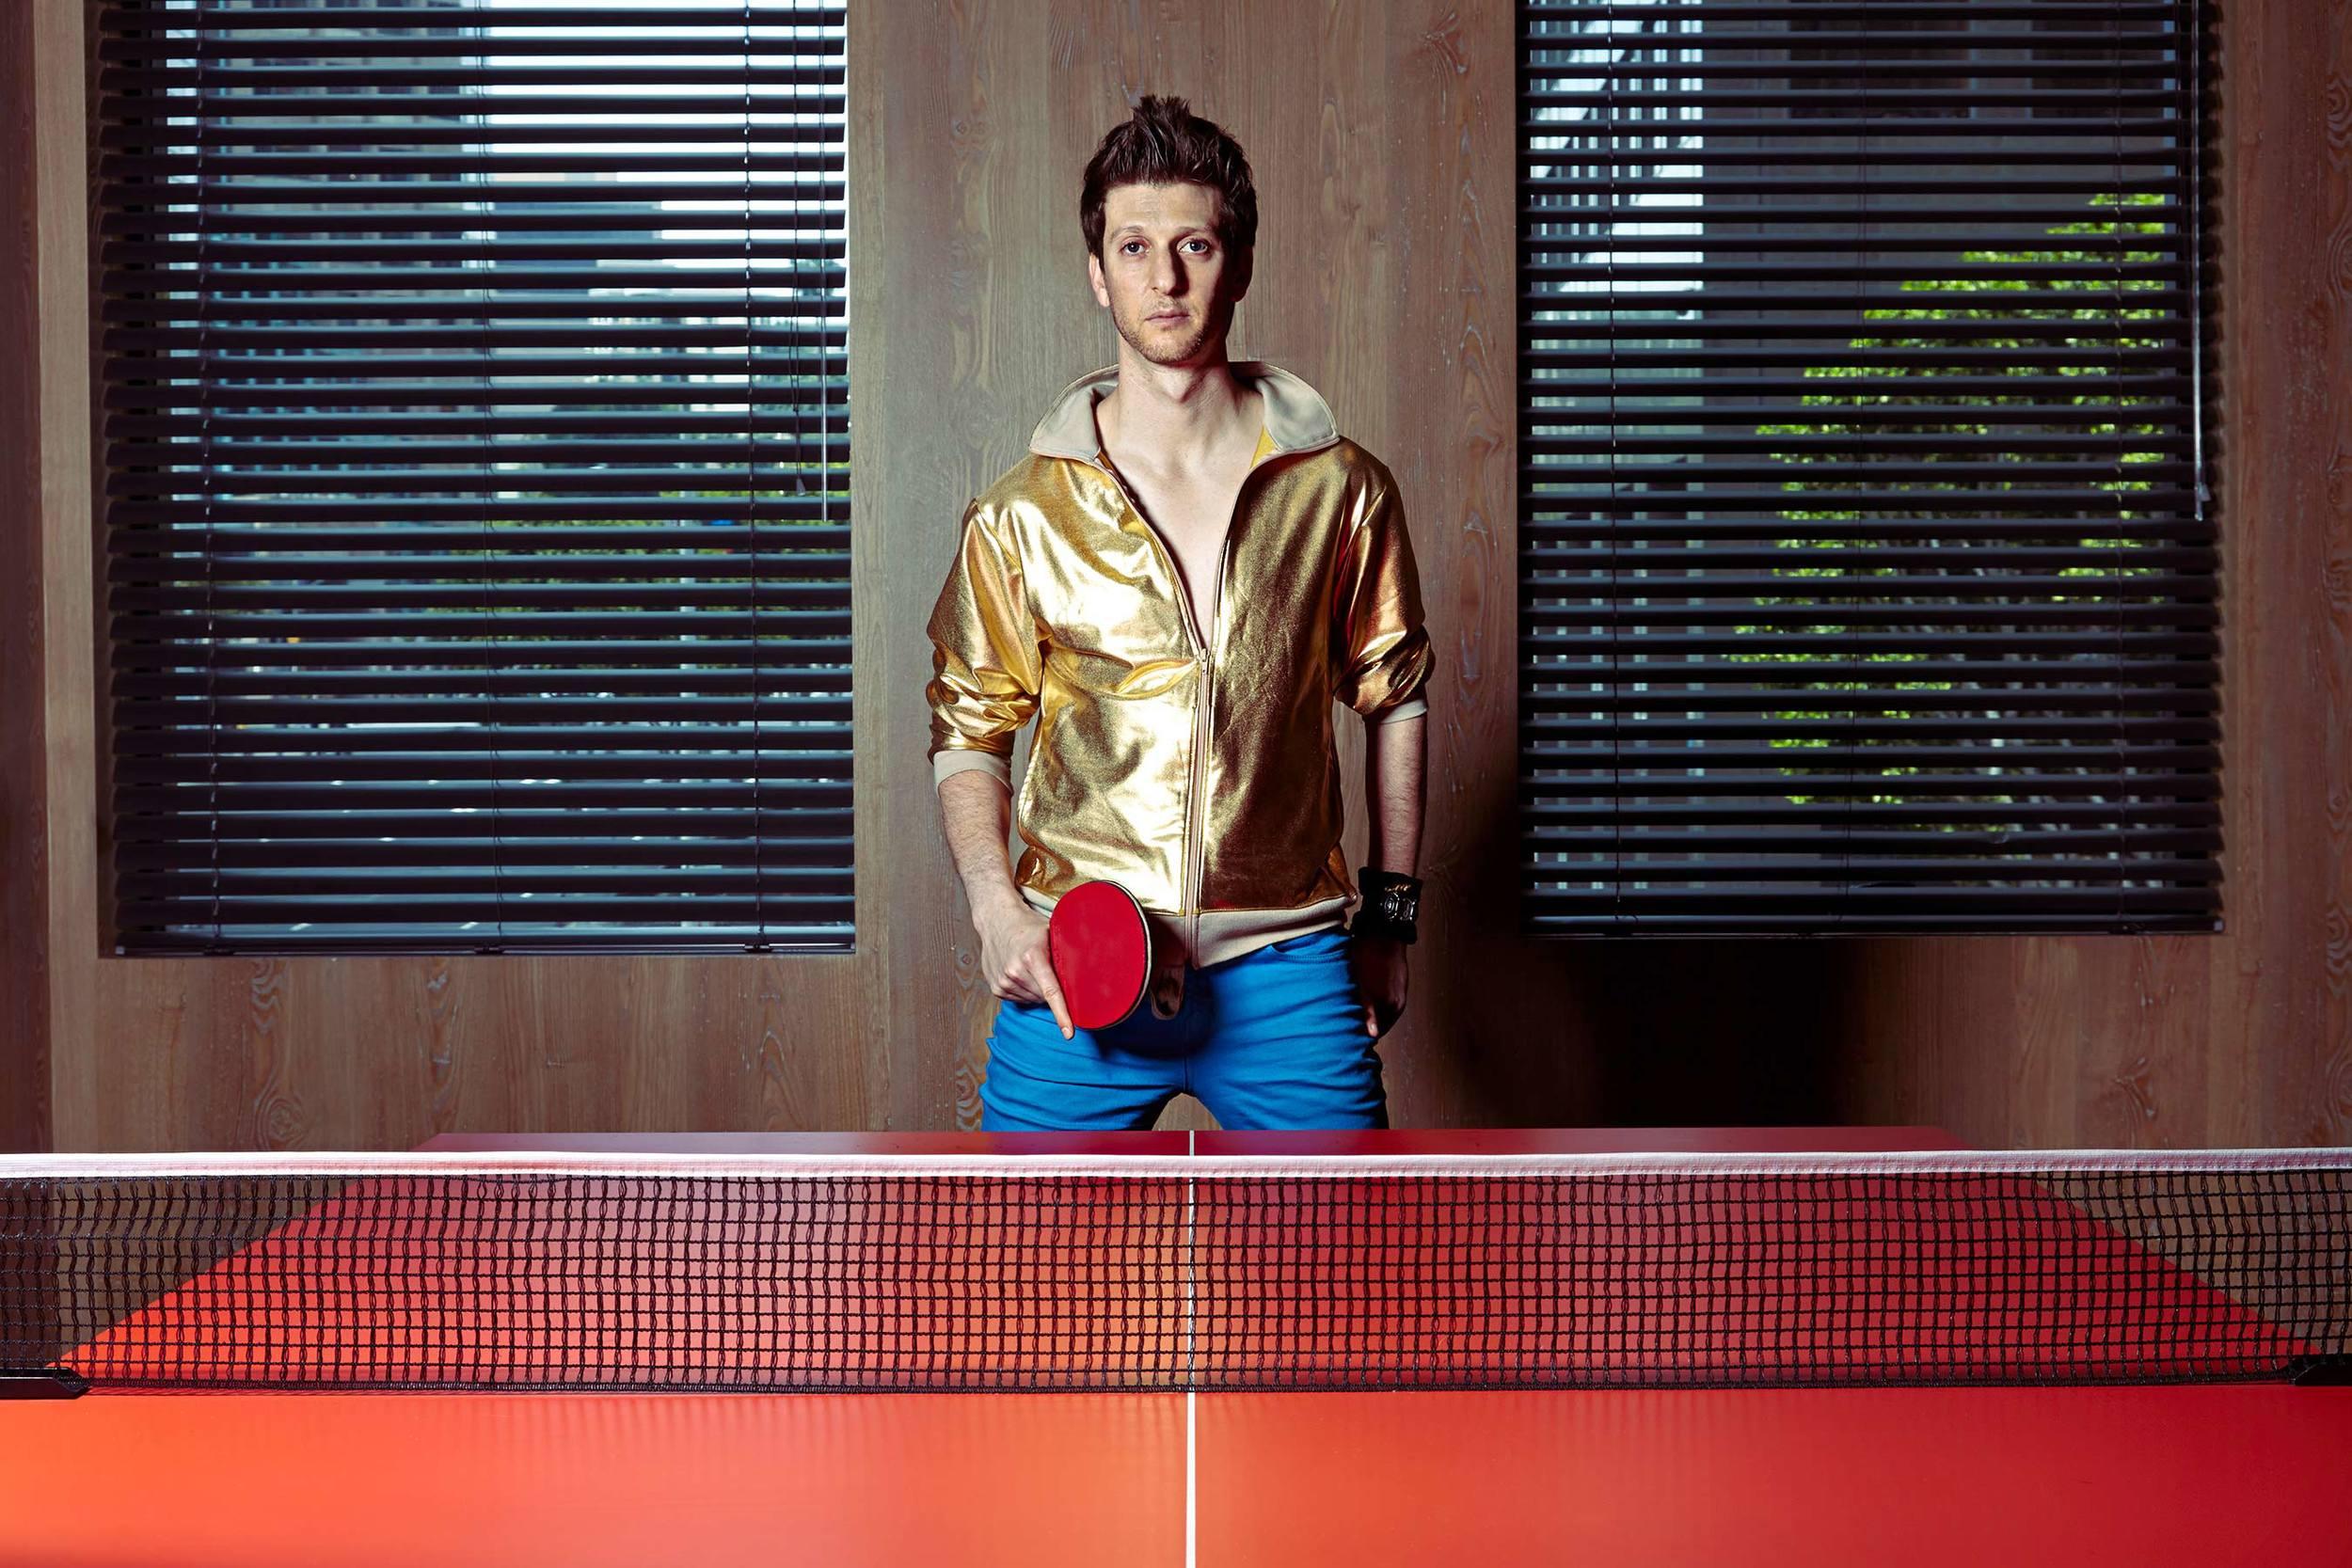 international table tennis champ, Adam Bobrow